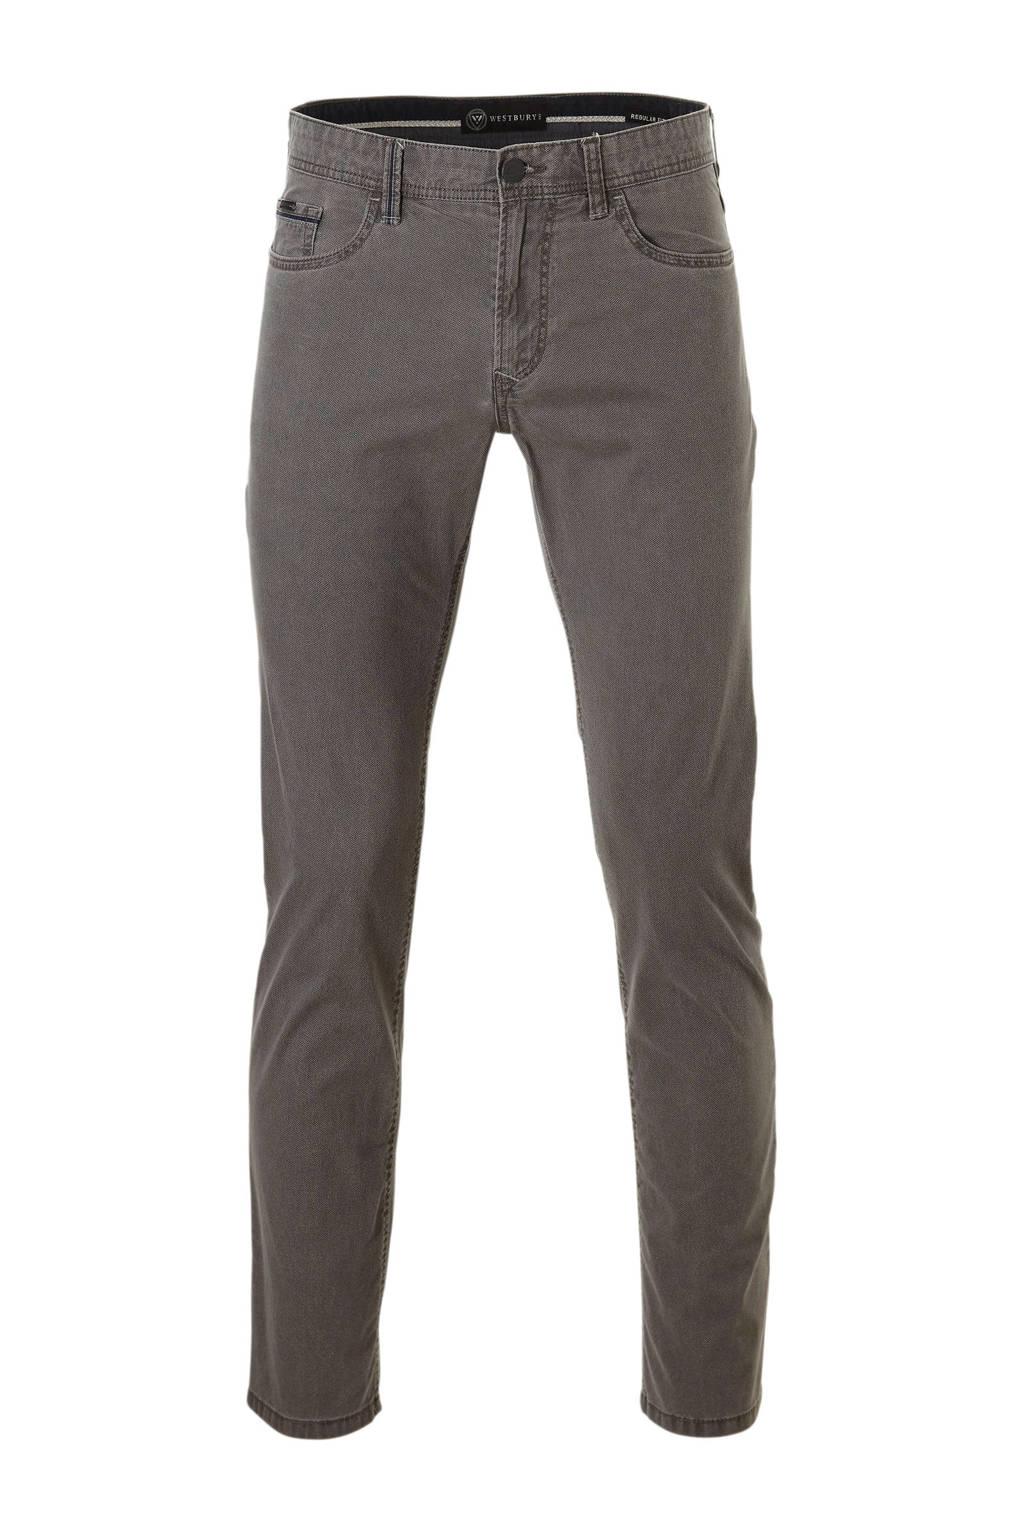 C&A Westbury regular fit jeans, Grijs